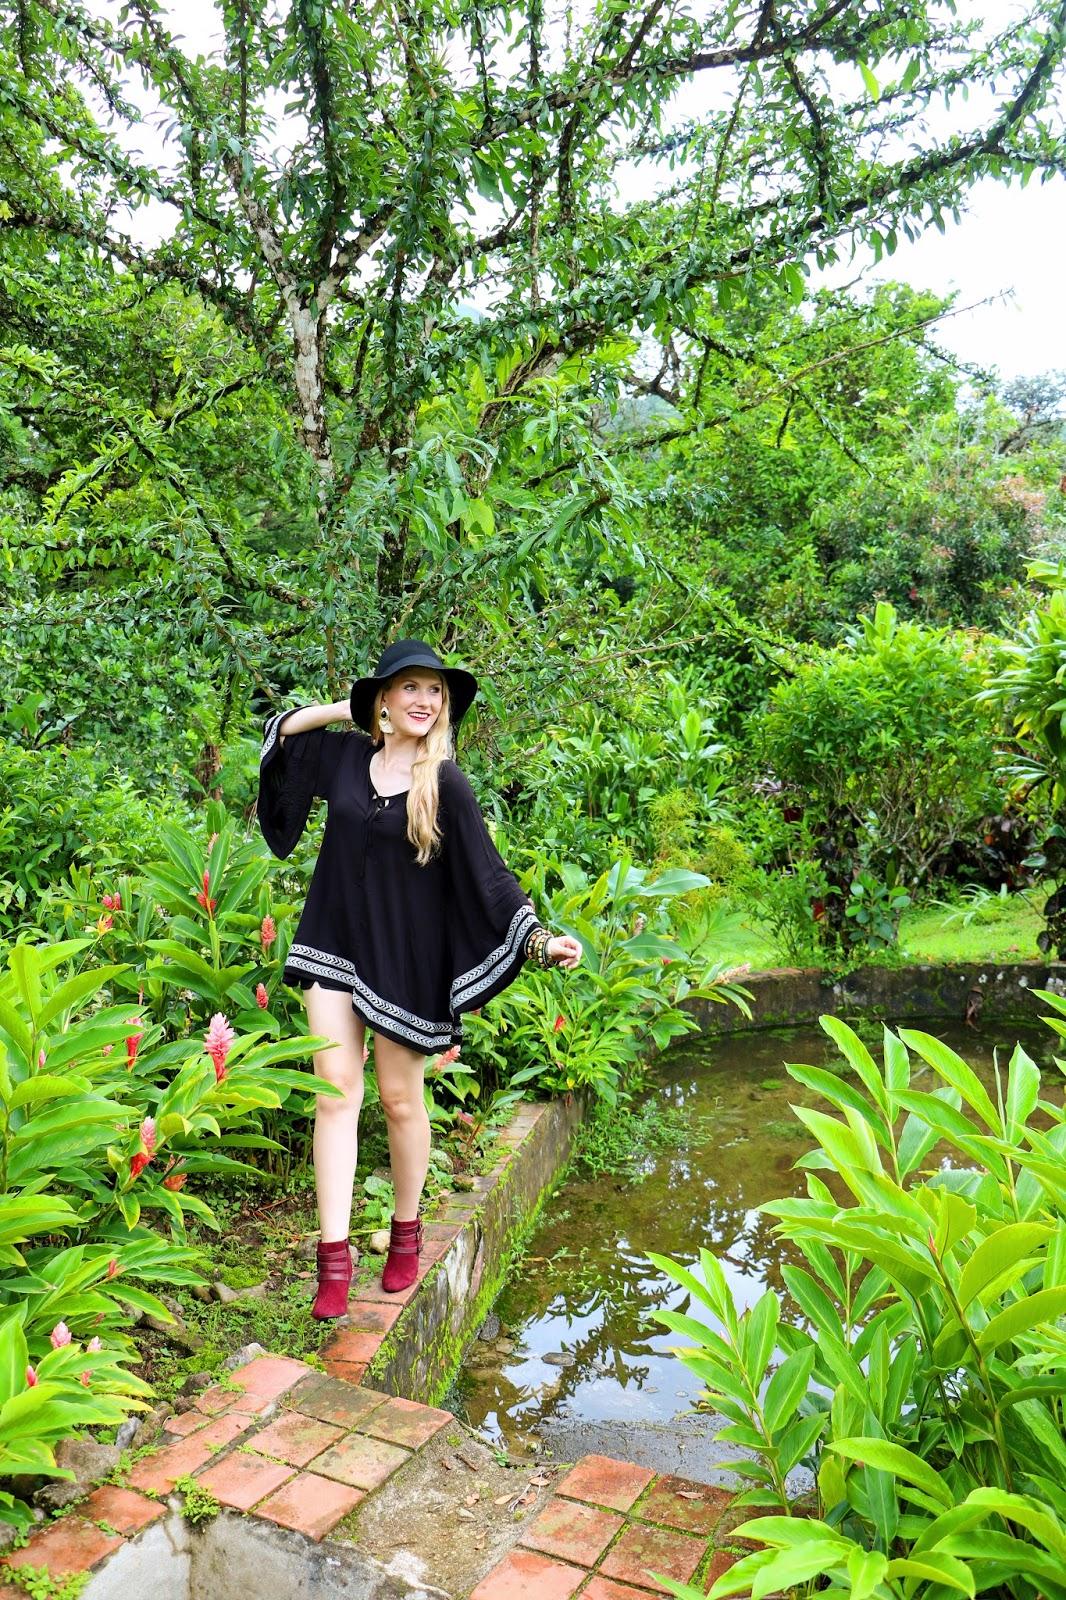 Boho outfit with a poncho